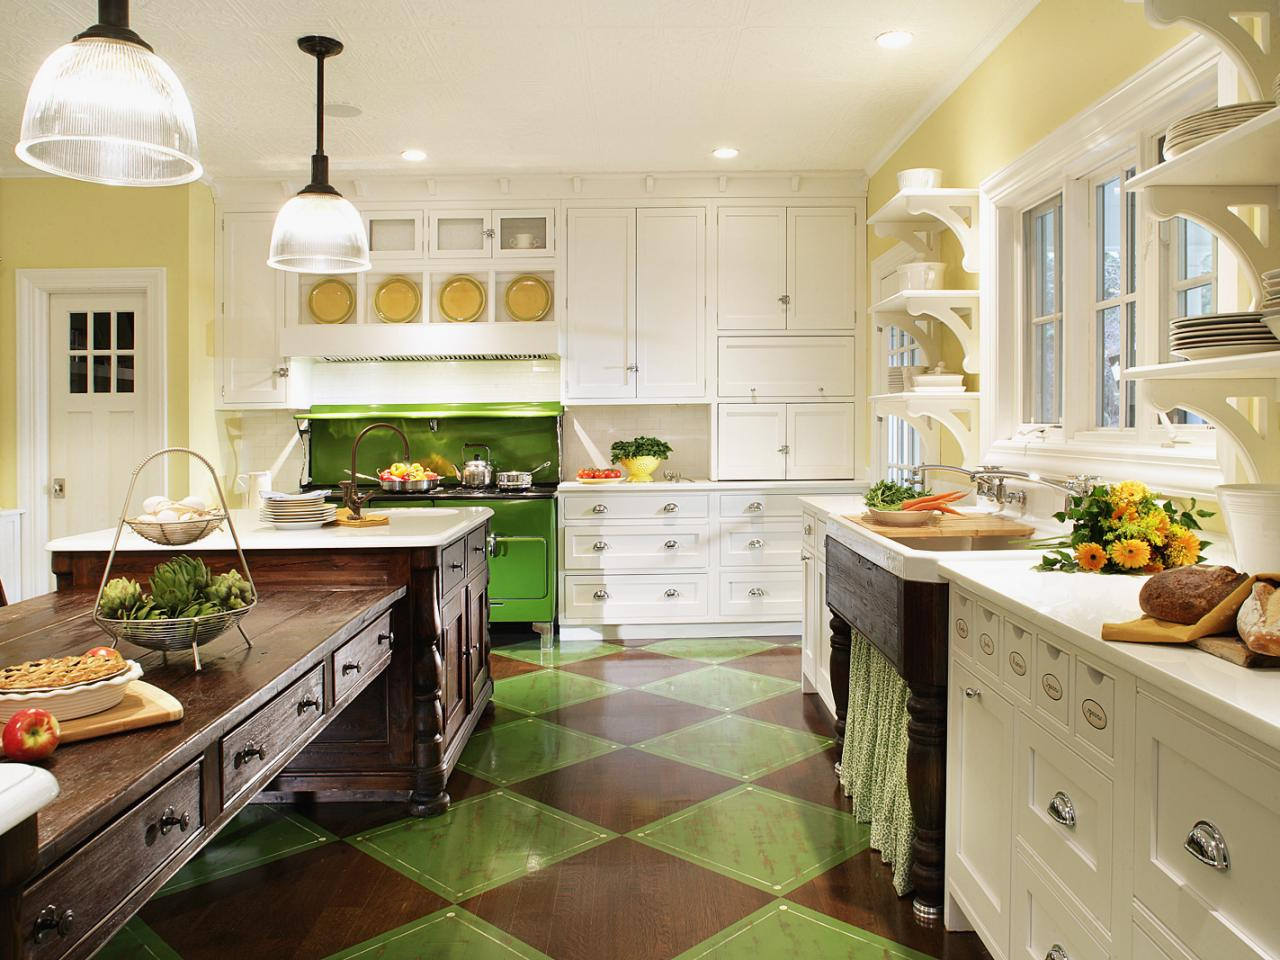 staining kitchen cabinets pictures ideas tips from hgtv hgtv - Regina Kitchen Cabinets